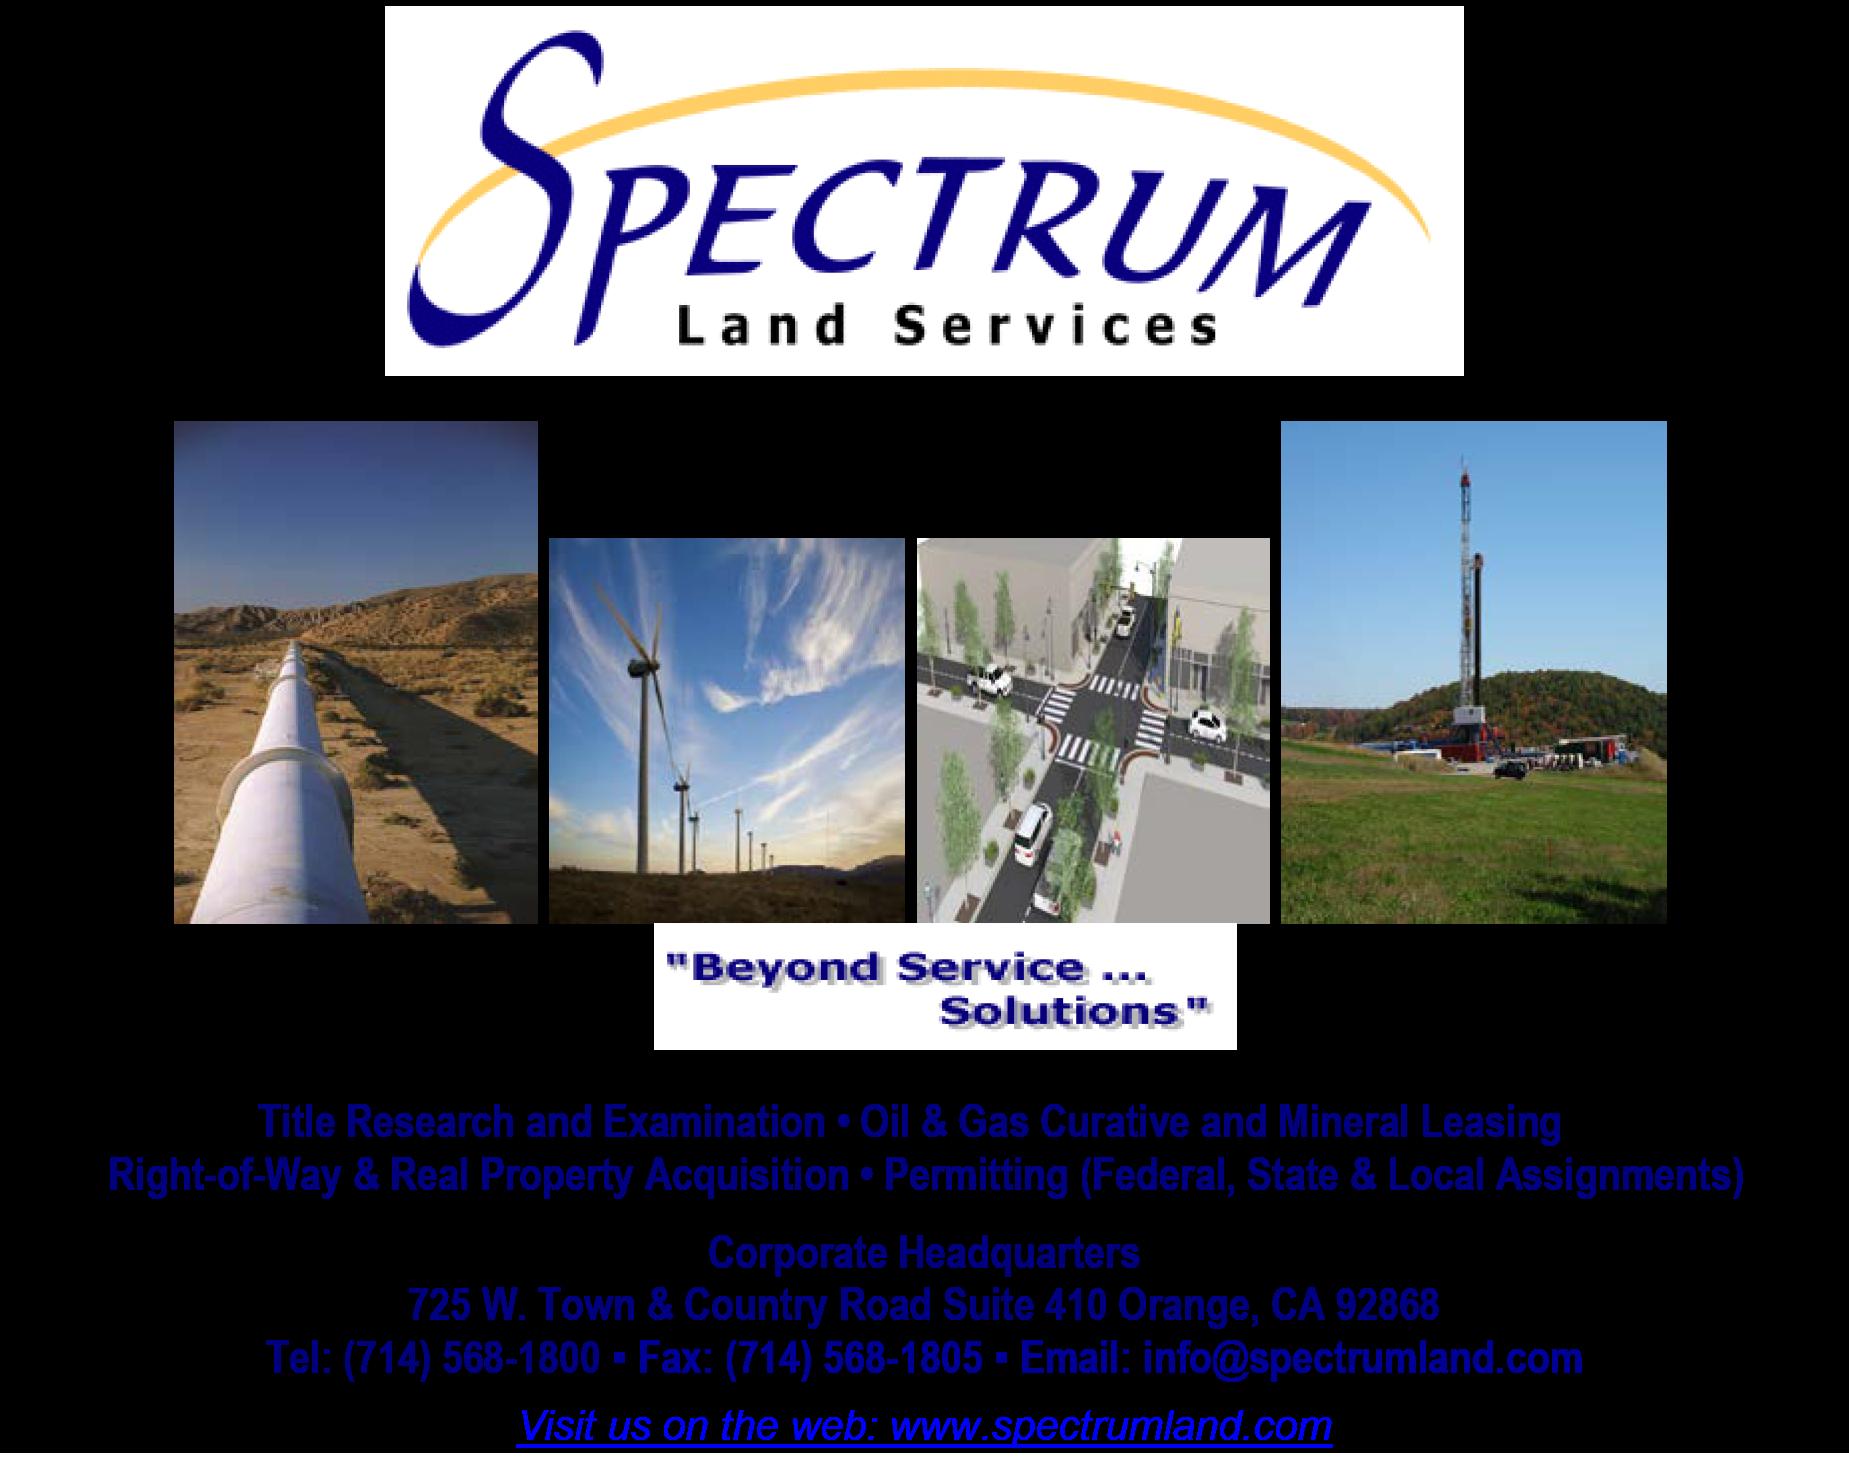 Spectrum Advert 2015-2016 half page2.png